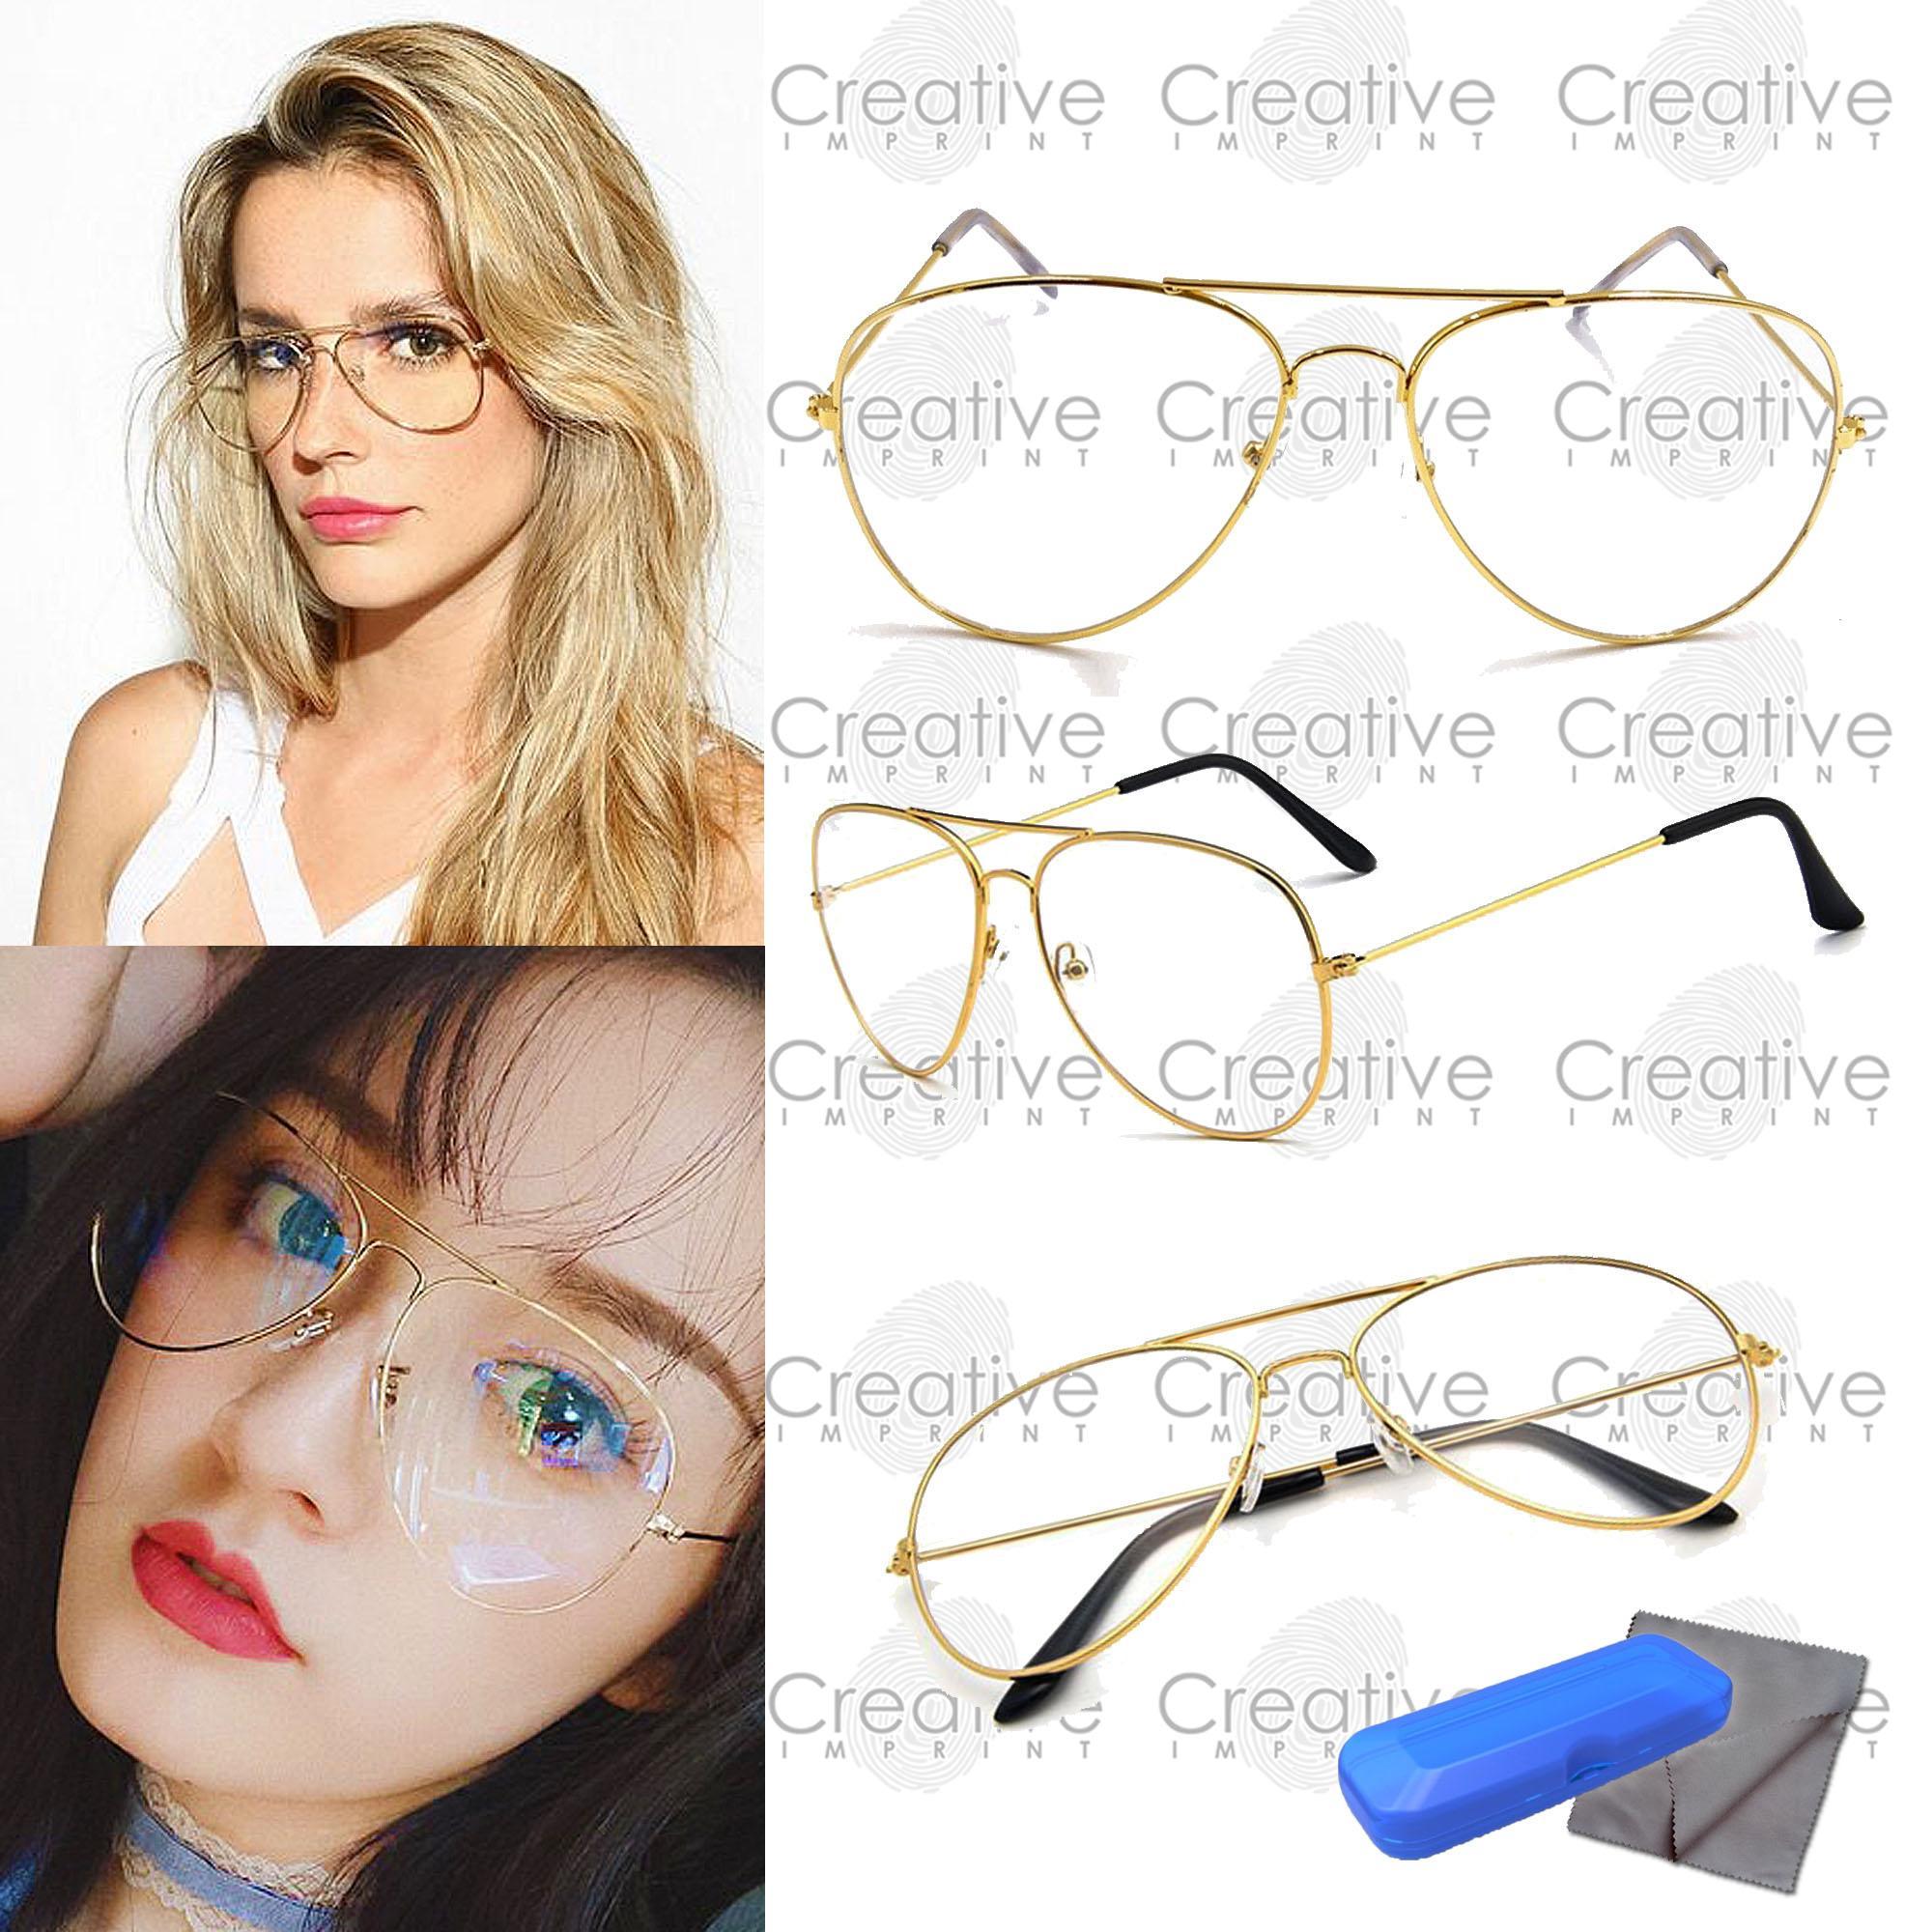 Creative Imprint Aviator Teardrop Pilot Specs (Clear Lens Gold Frame)  Sunnies Trendy Fashion Eyeglasses f1ec8e220f